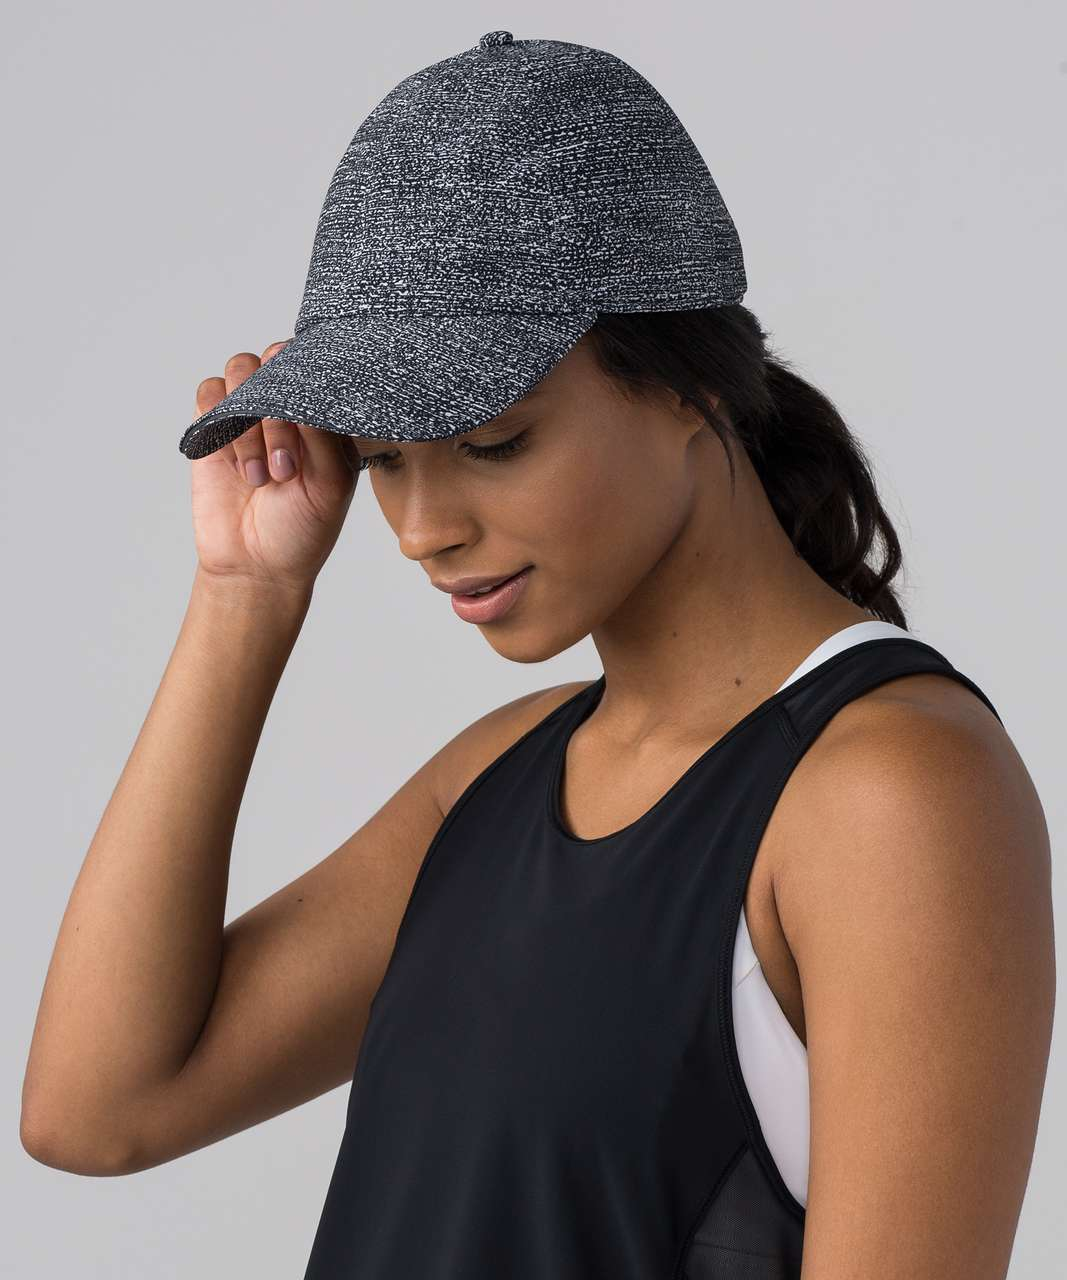 c1ff1e5d Lululemon Baller Hat Run - Salt Alpine White Black - lulu fanatics